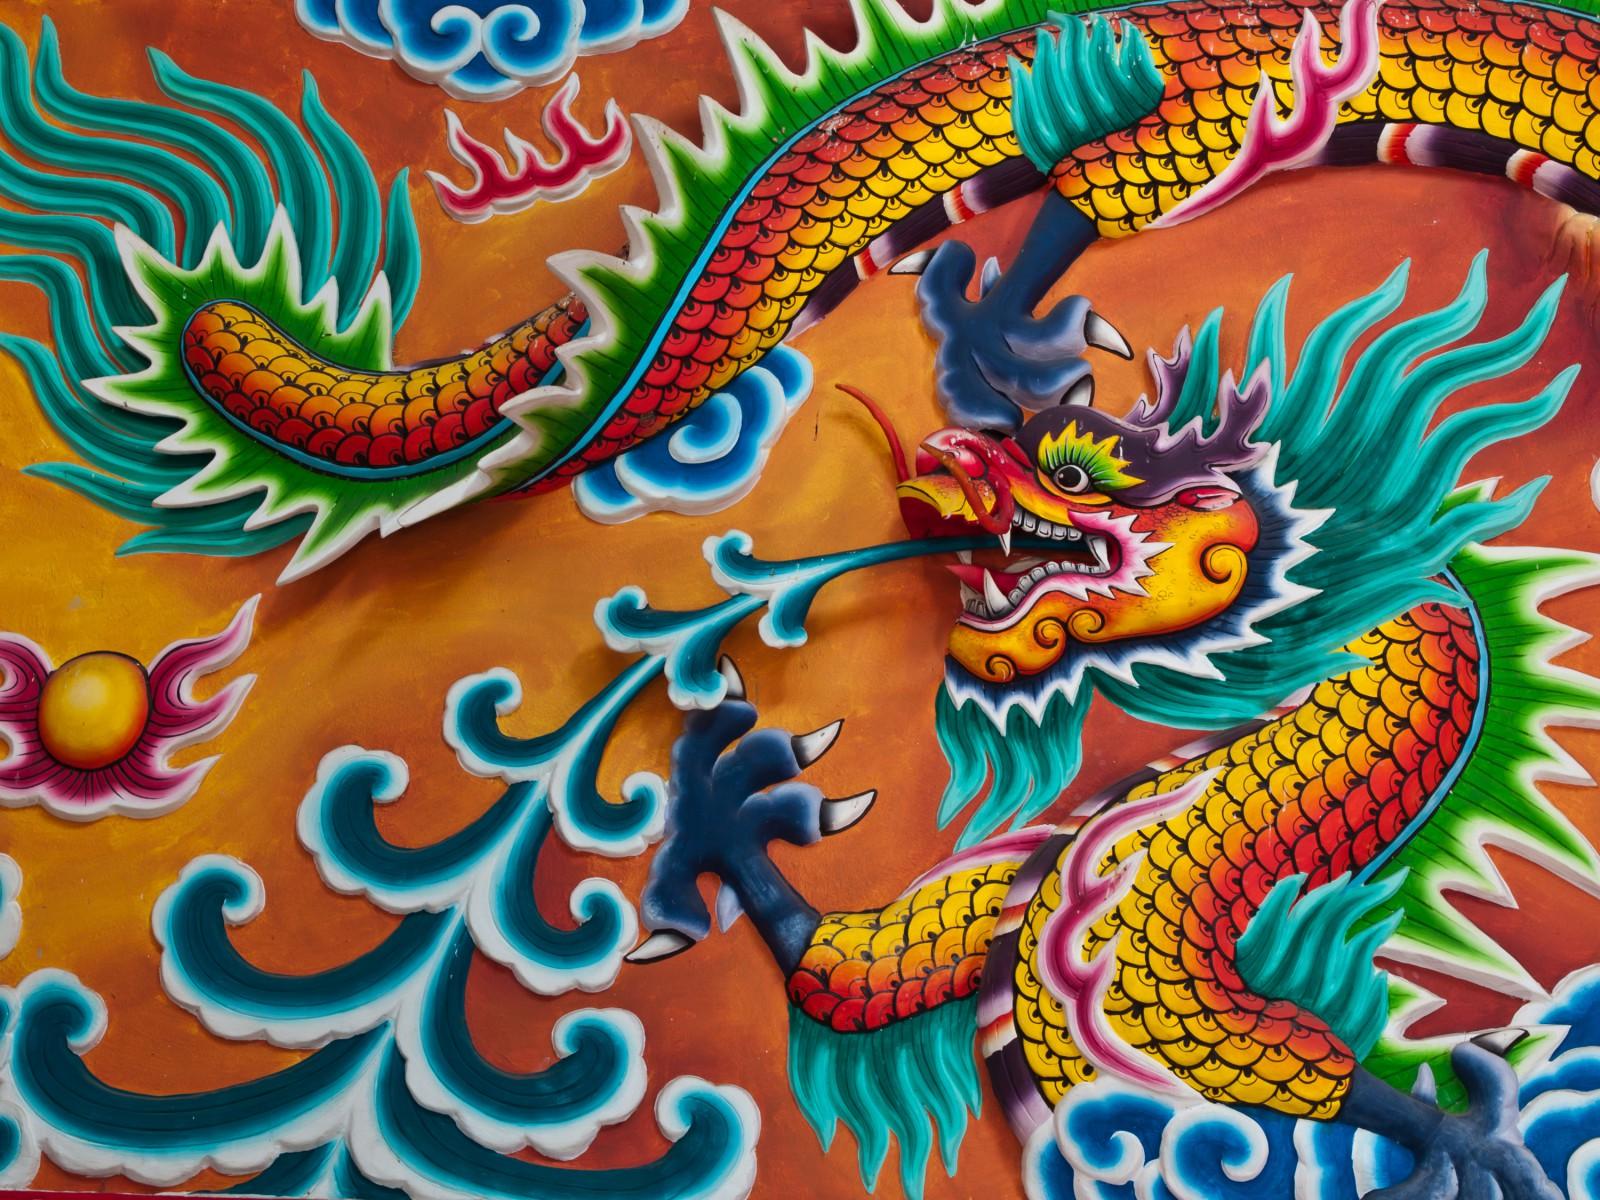 S/He Dragon